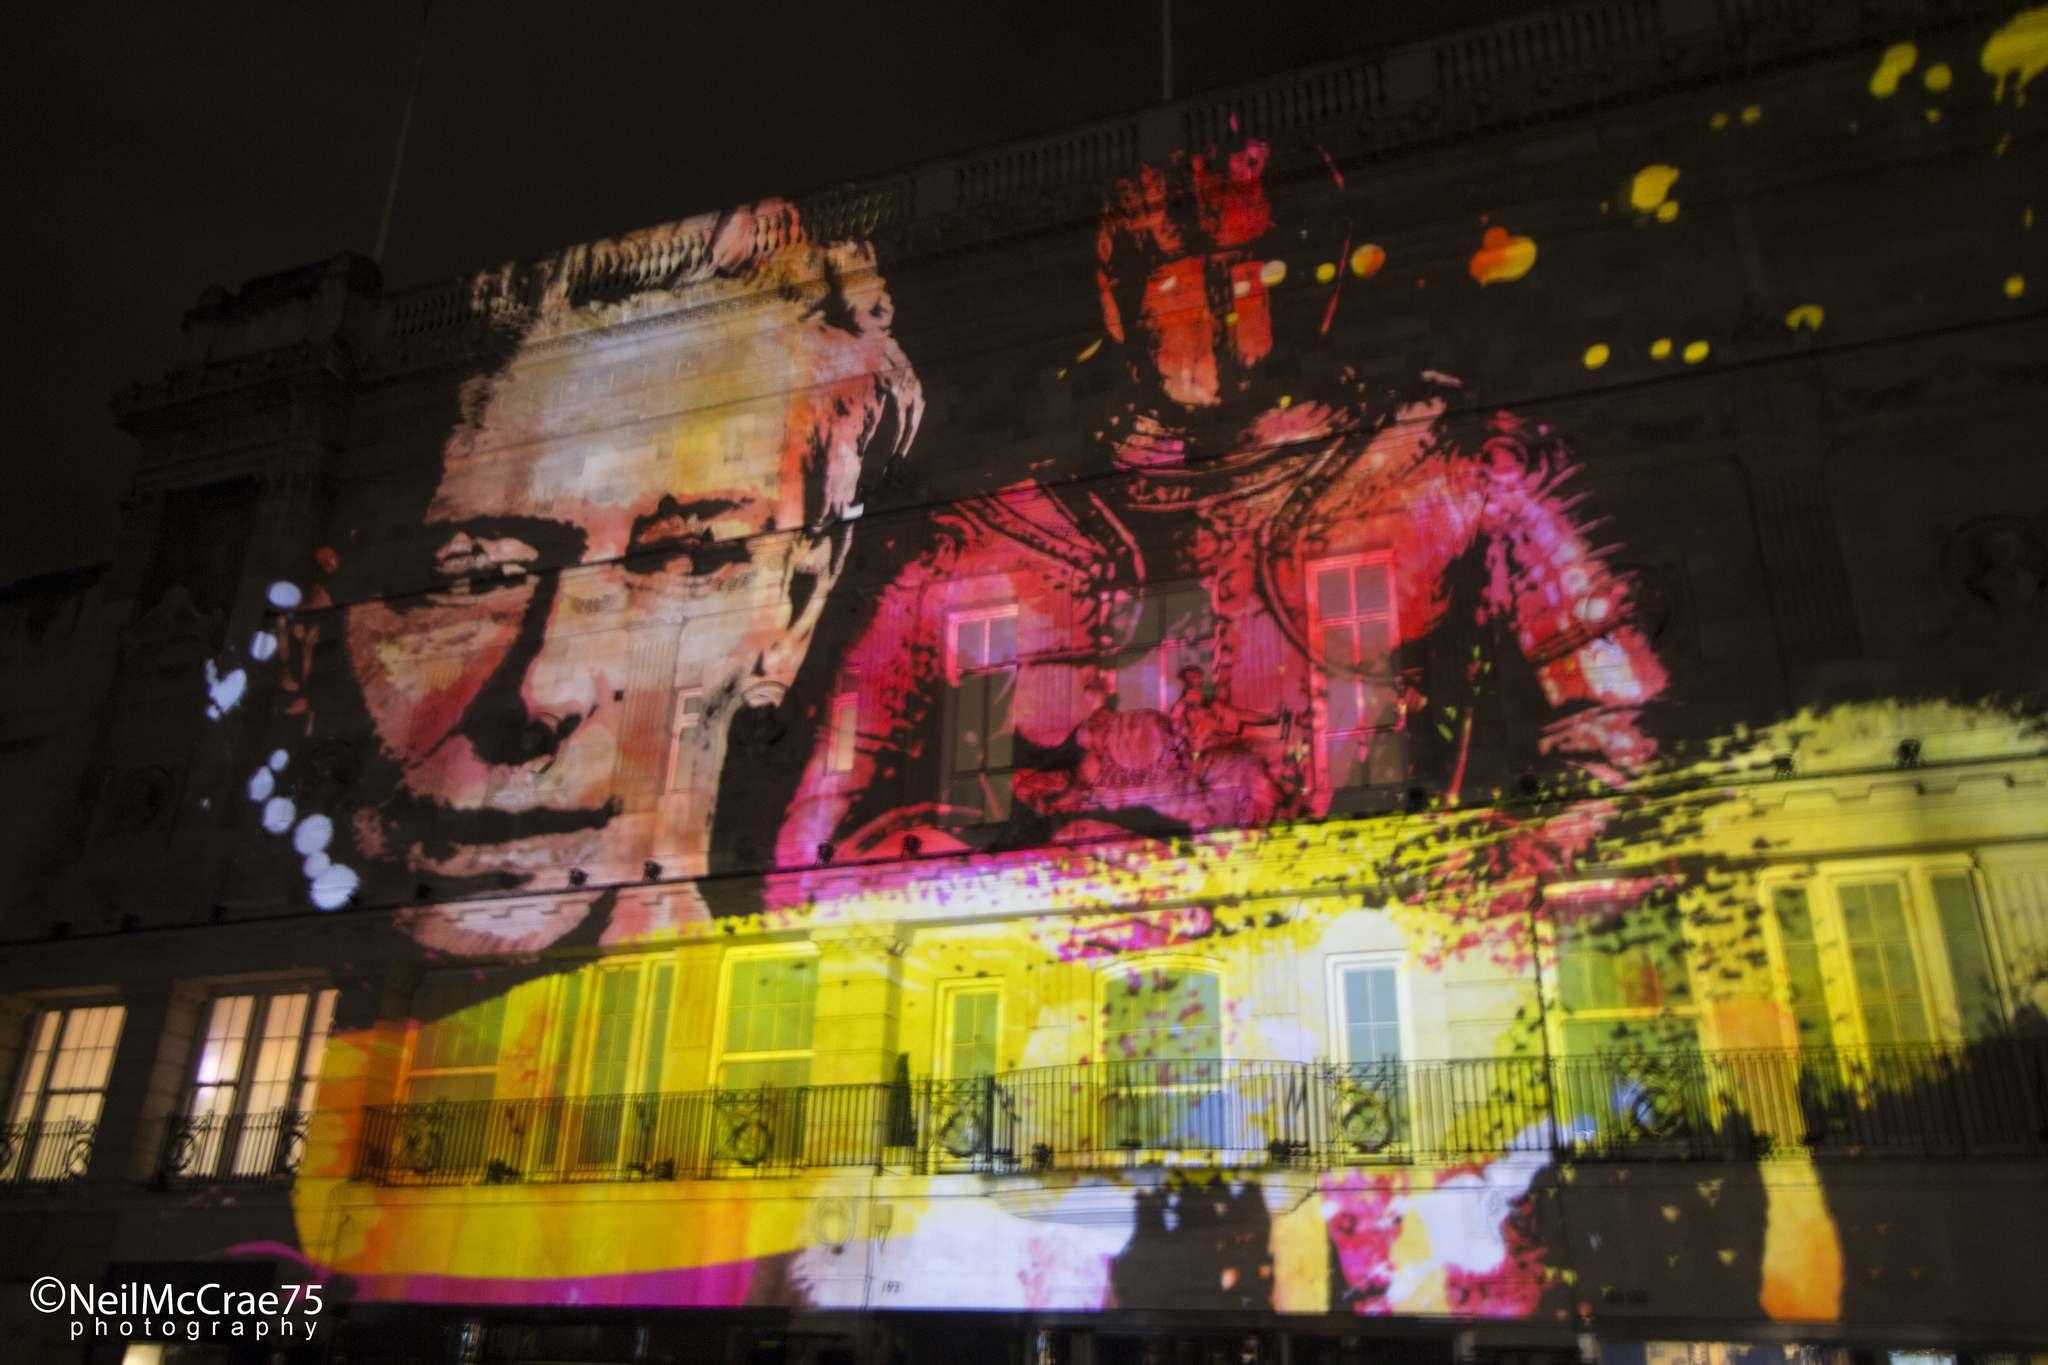 london lumiere festival1 The London Light Lumiere Festival by Neil McCrae